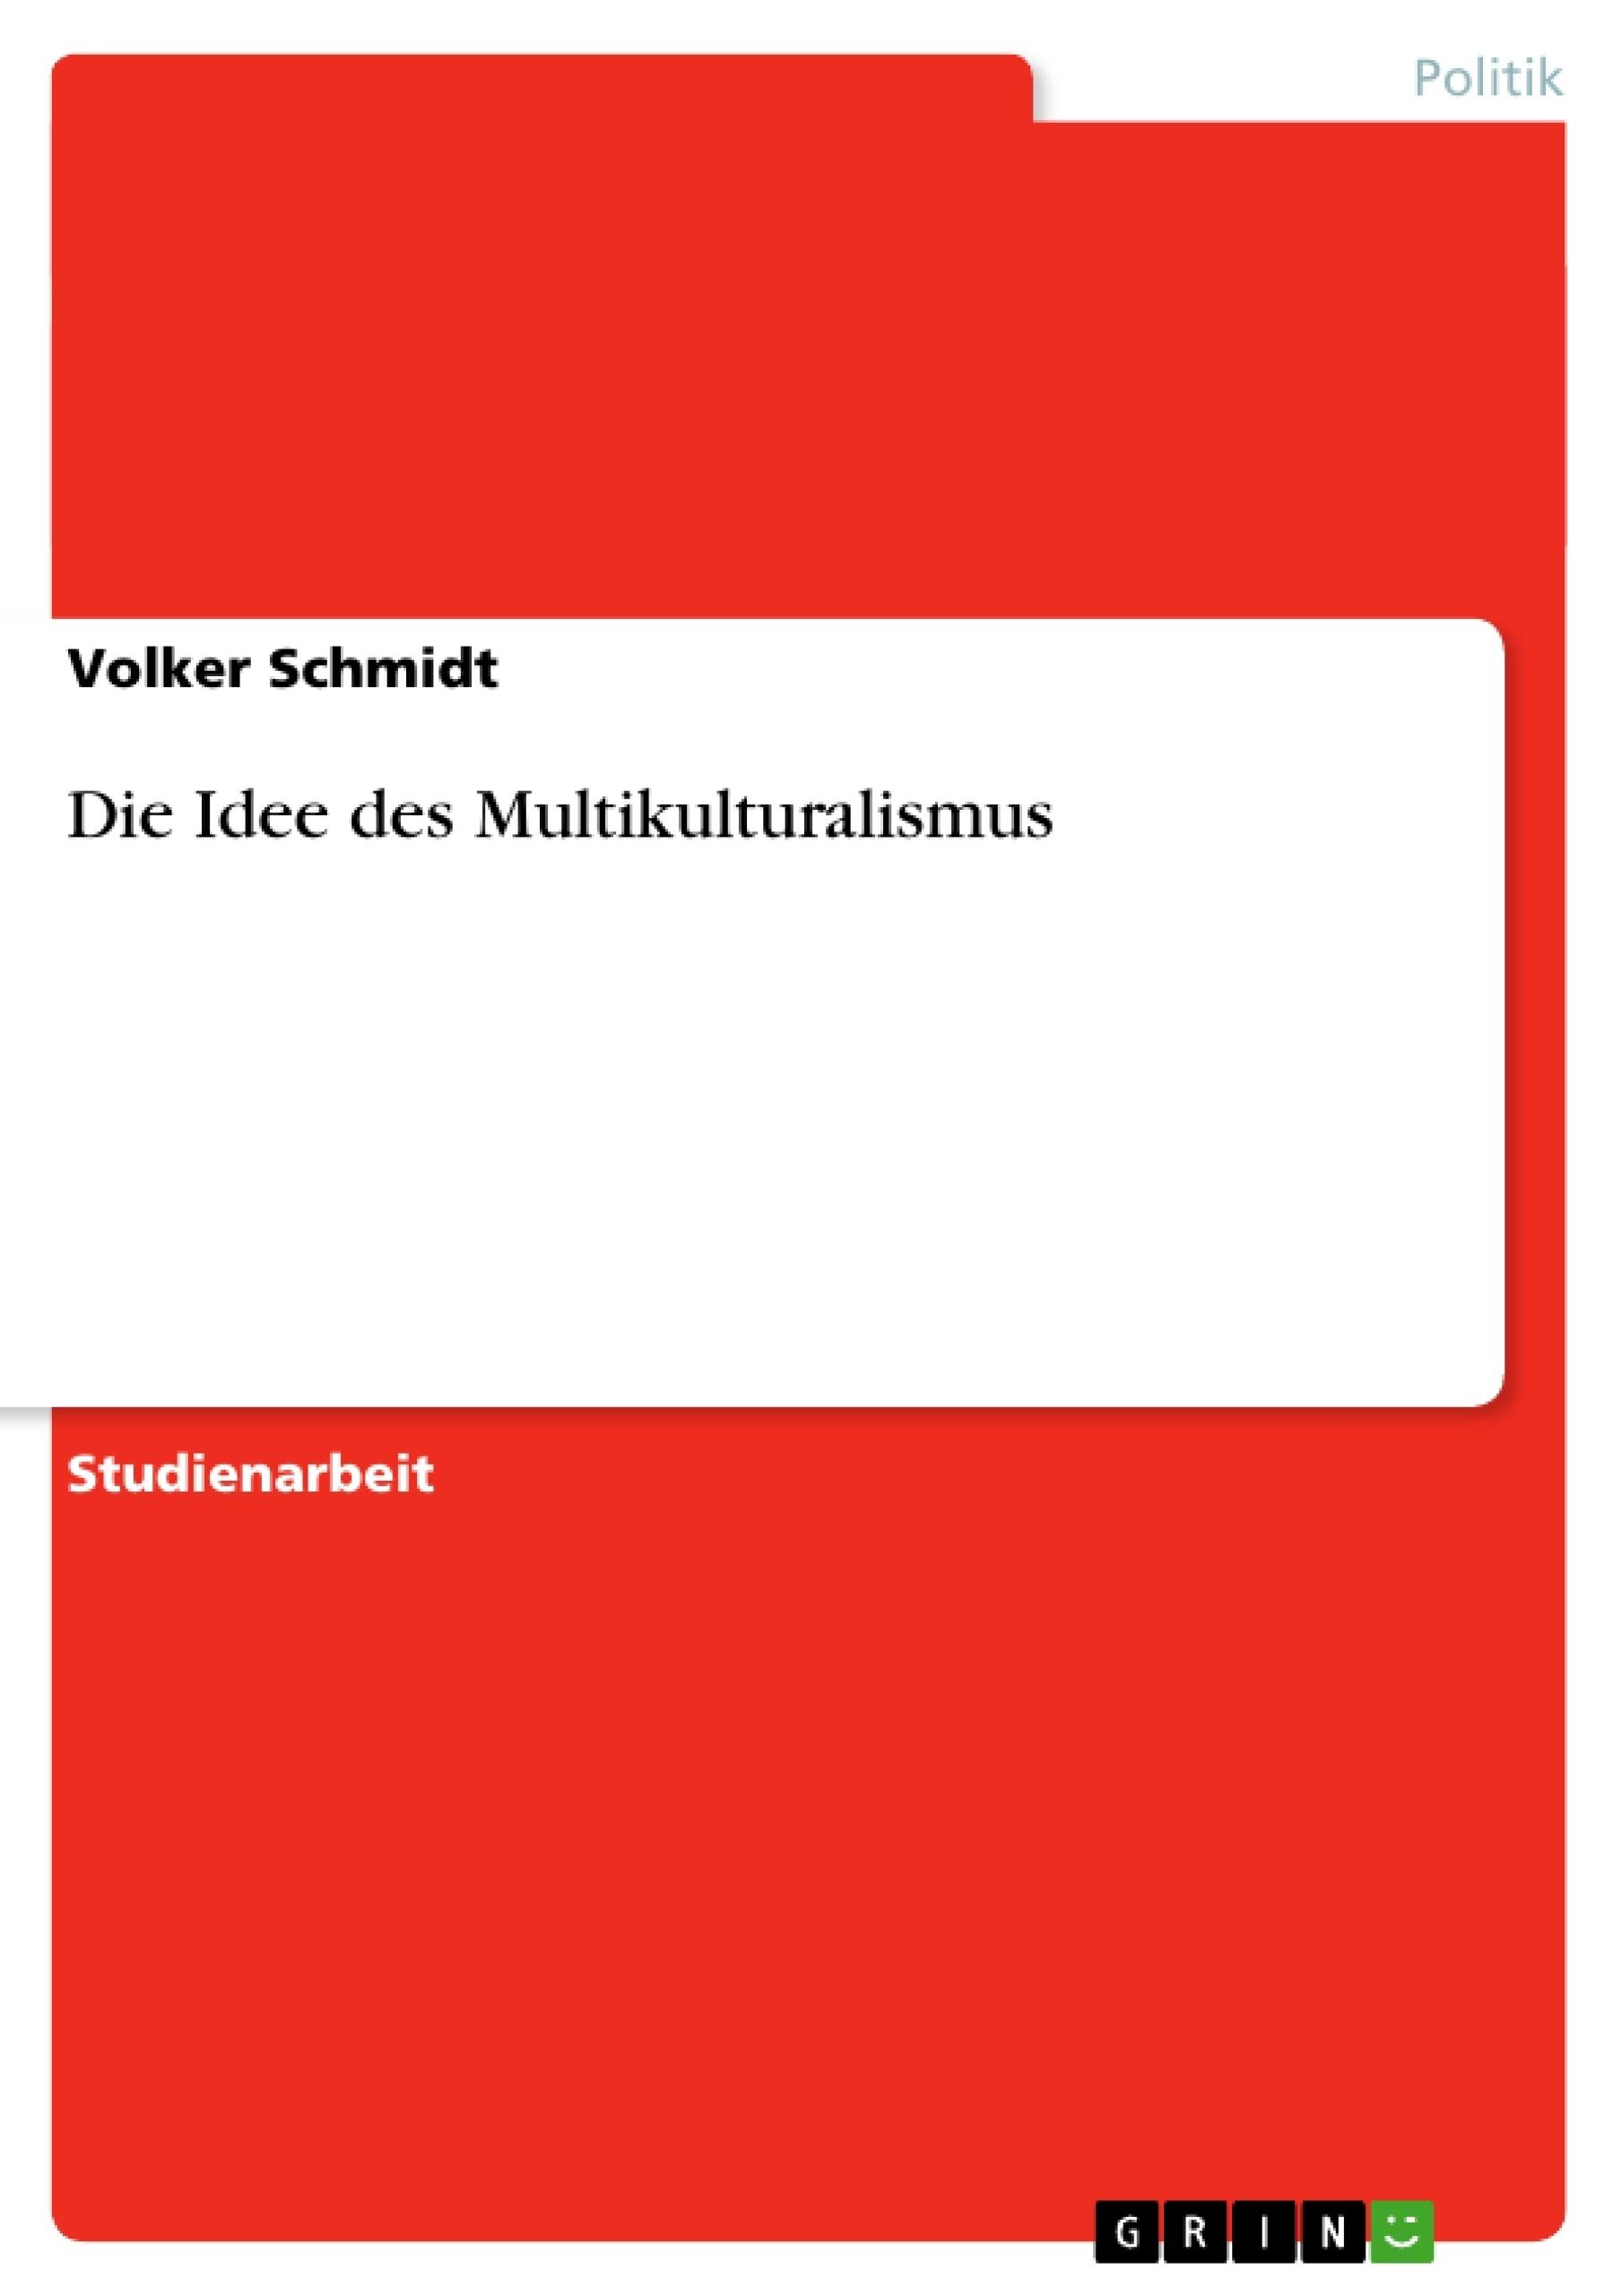 Titel: Die Idee des Multikulturalismus